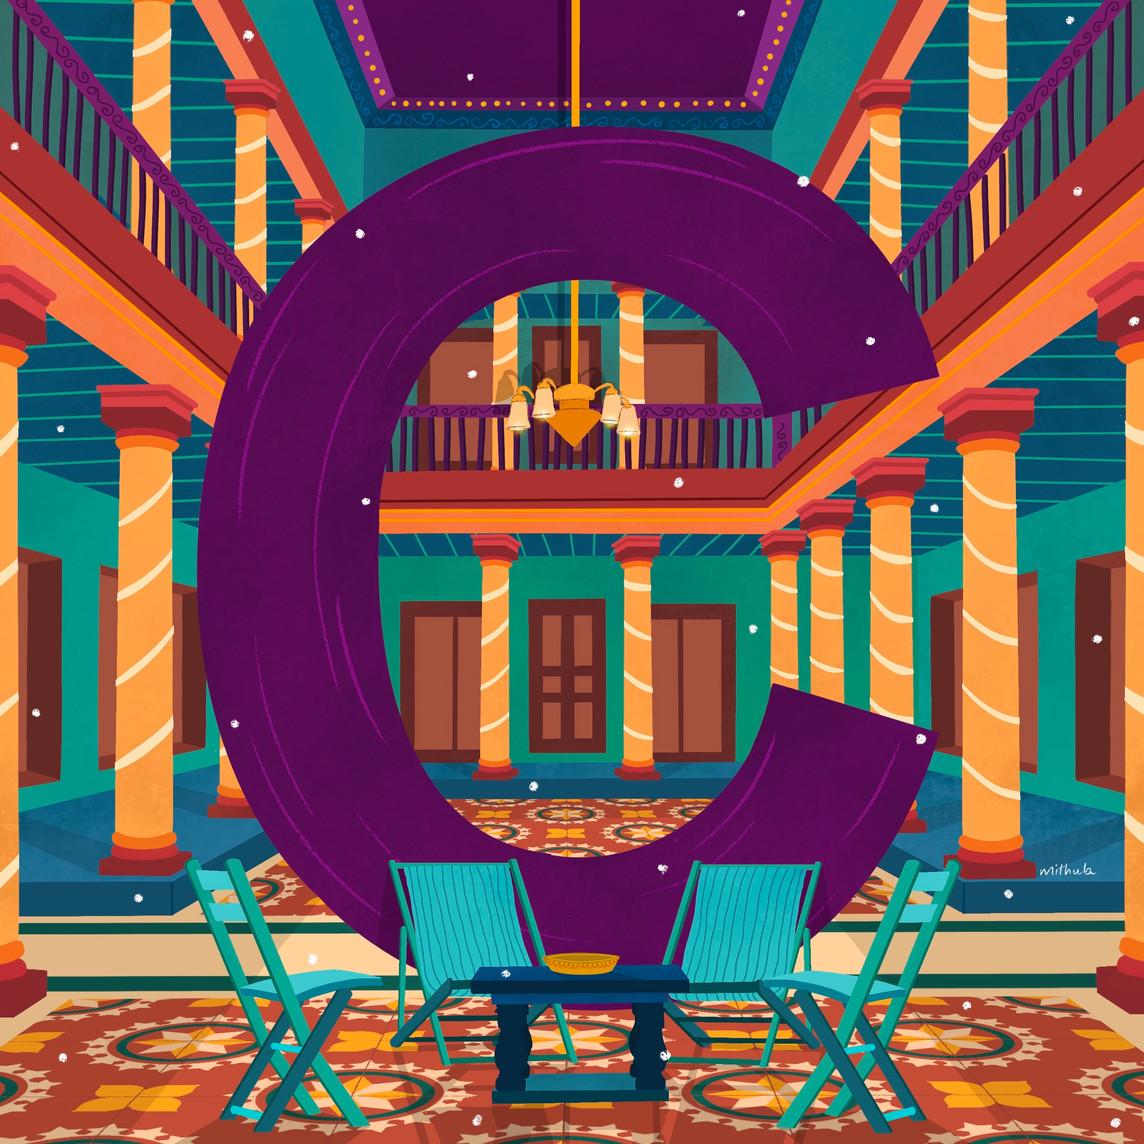 C for Chettinad Palace